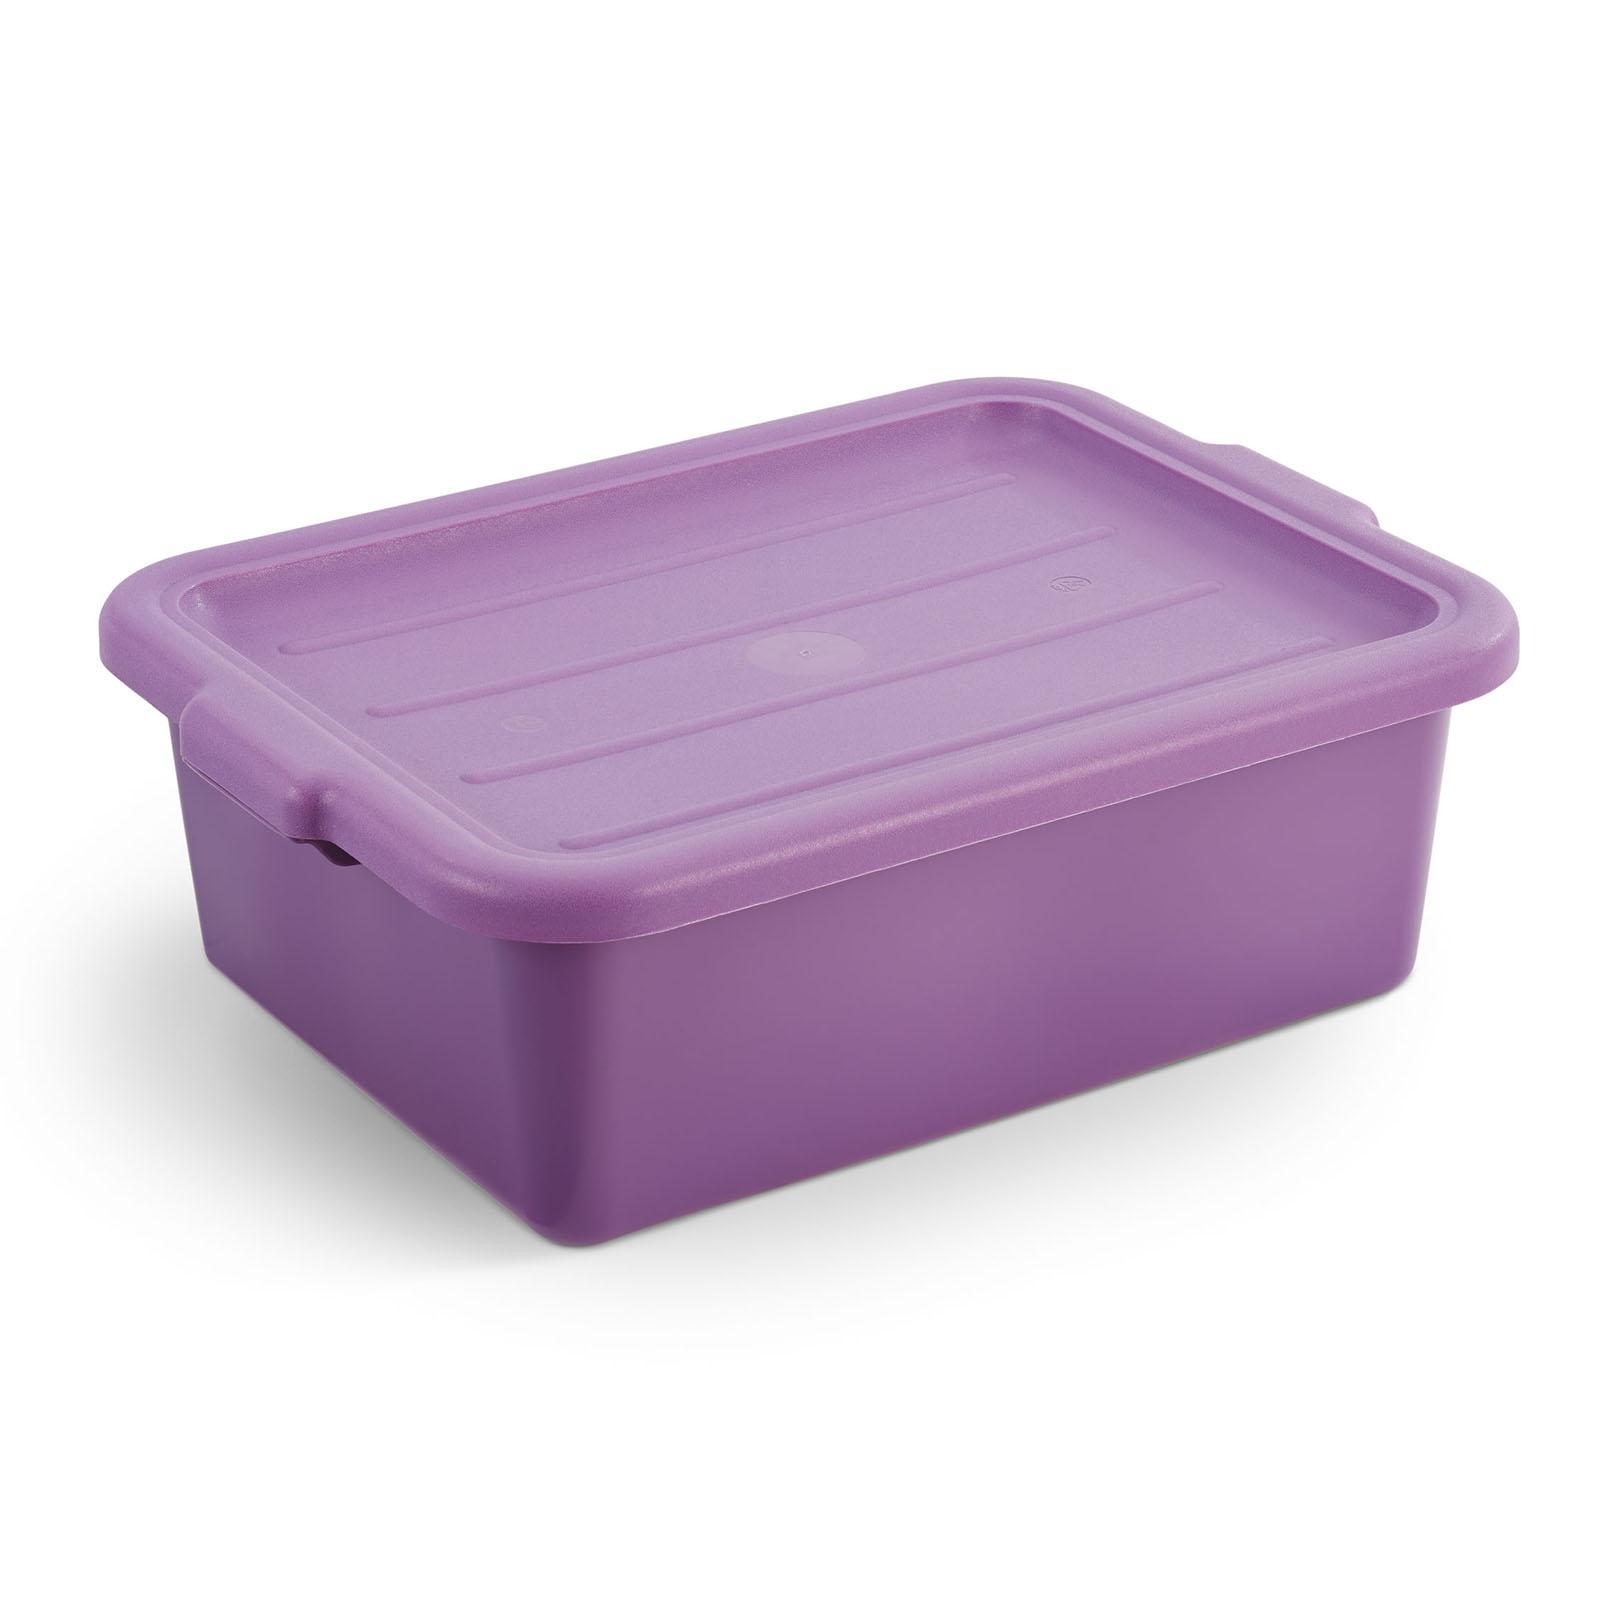 Vollrath 1535BRS6-C80 food storage container, box